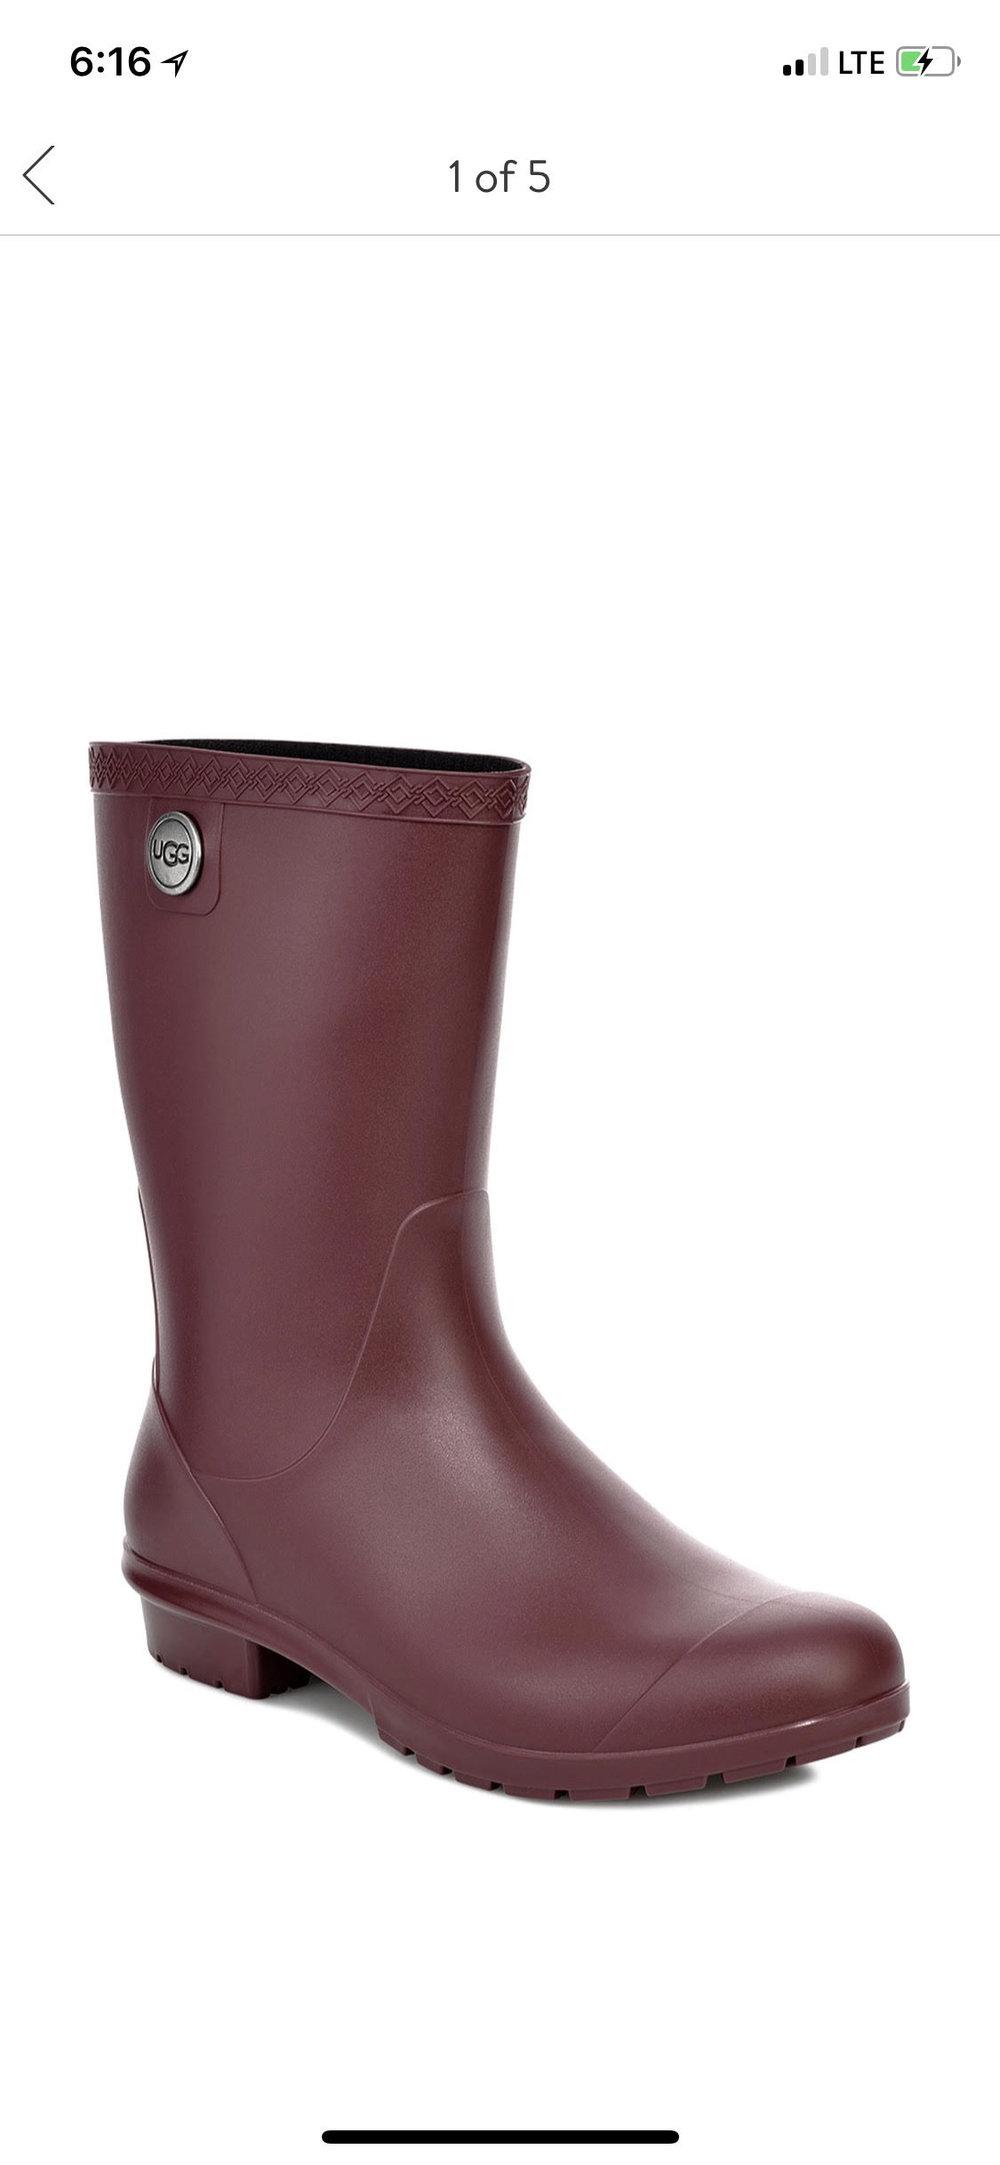 Ugg Rain boots.jpg